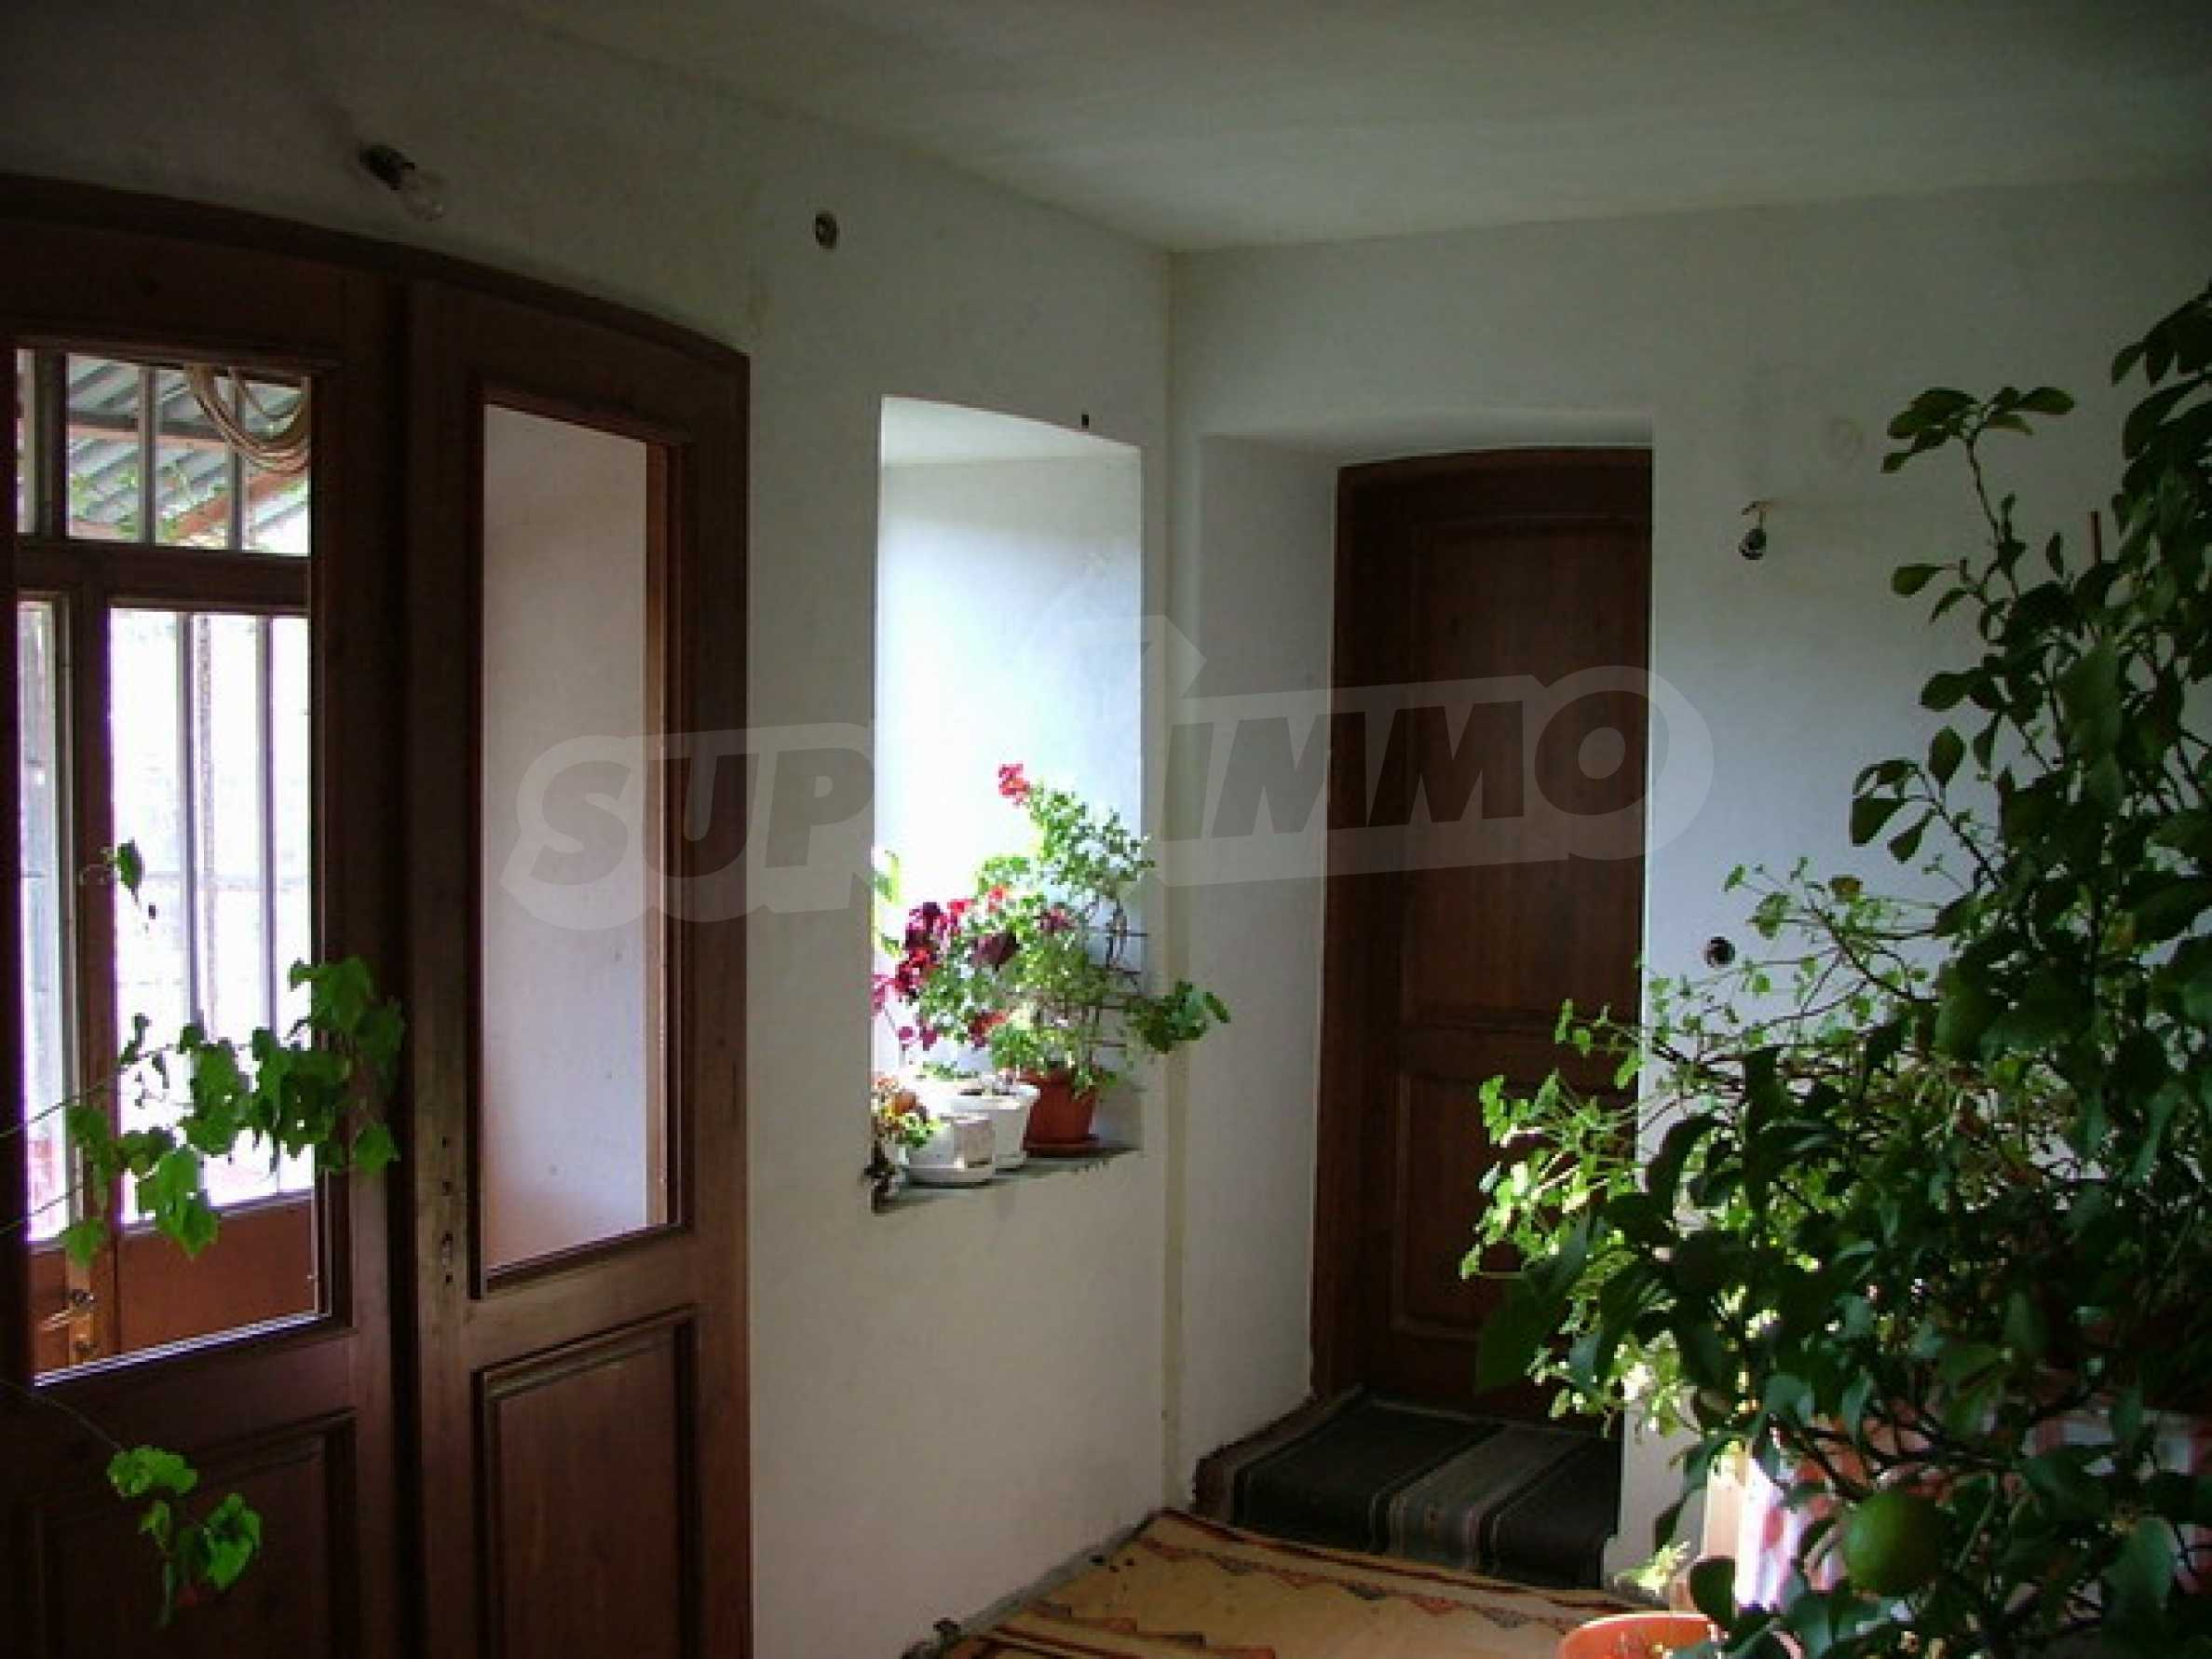 Stilvoll renovierte Villa 12 km entfernt. von Veliko Tarnovo 15